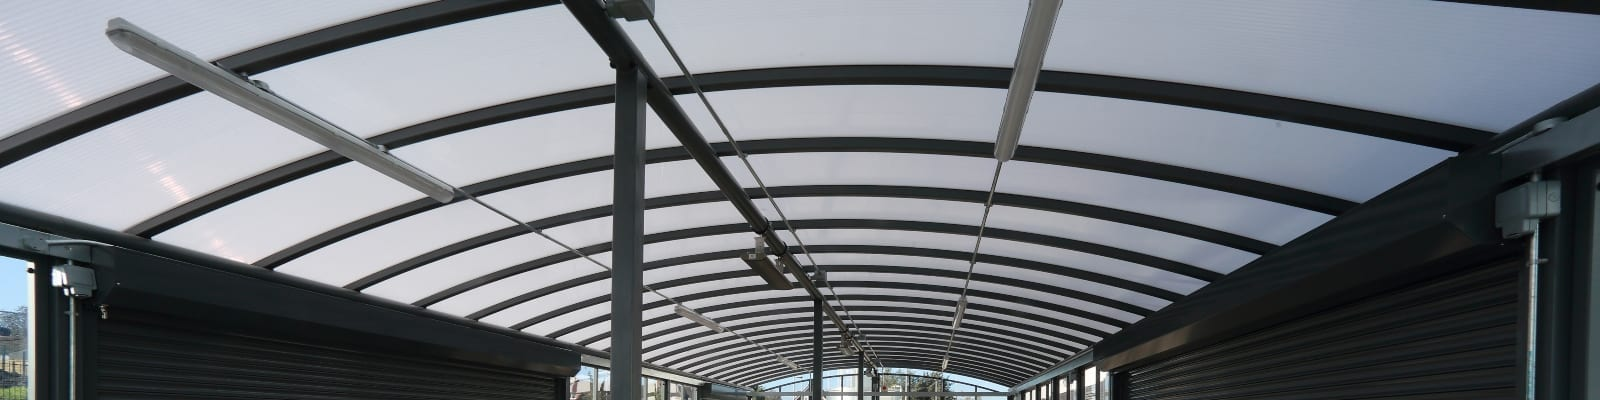 St Cuthbert's School Enclosed Shelter